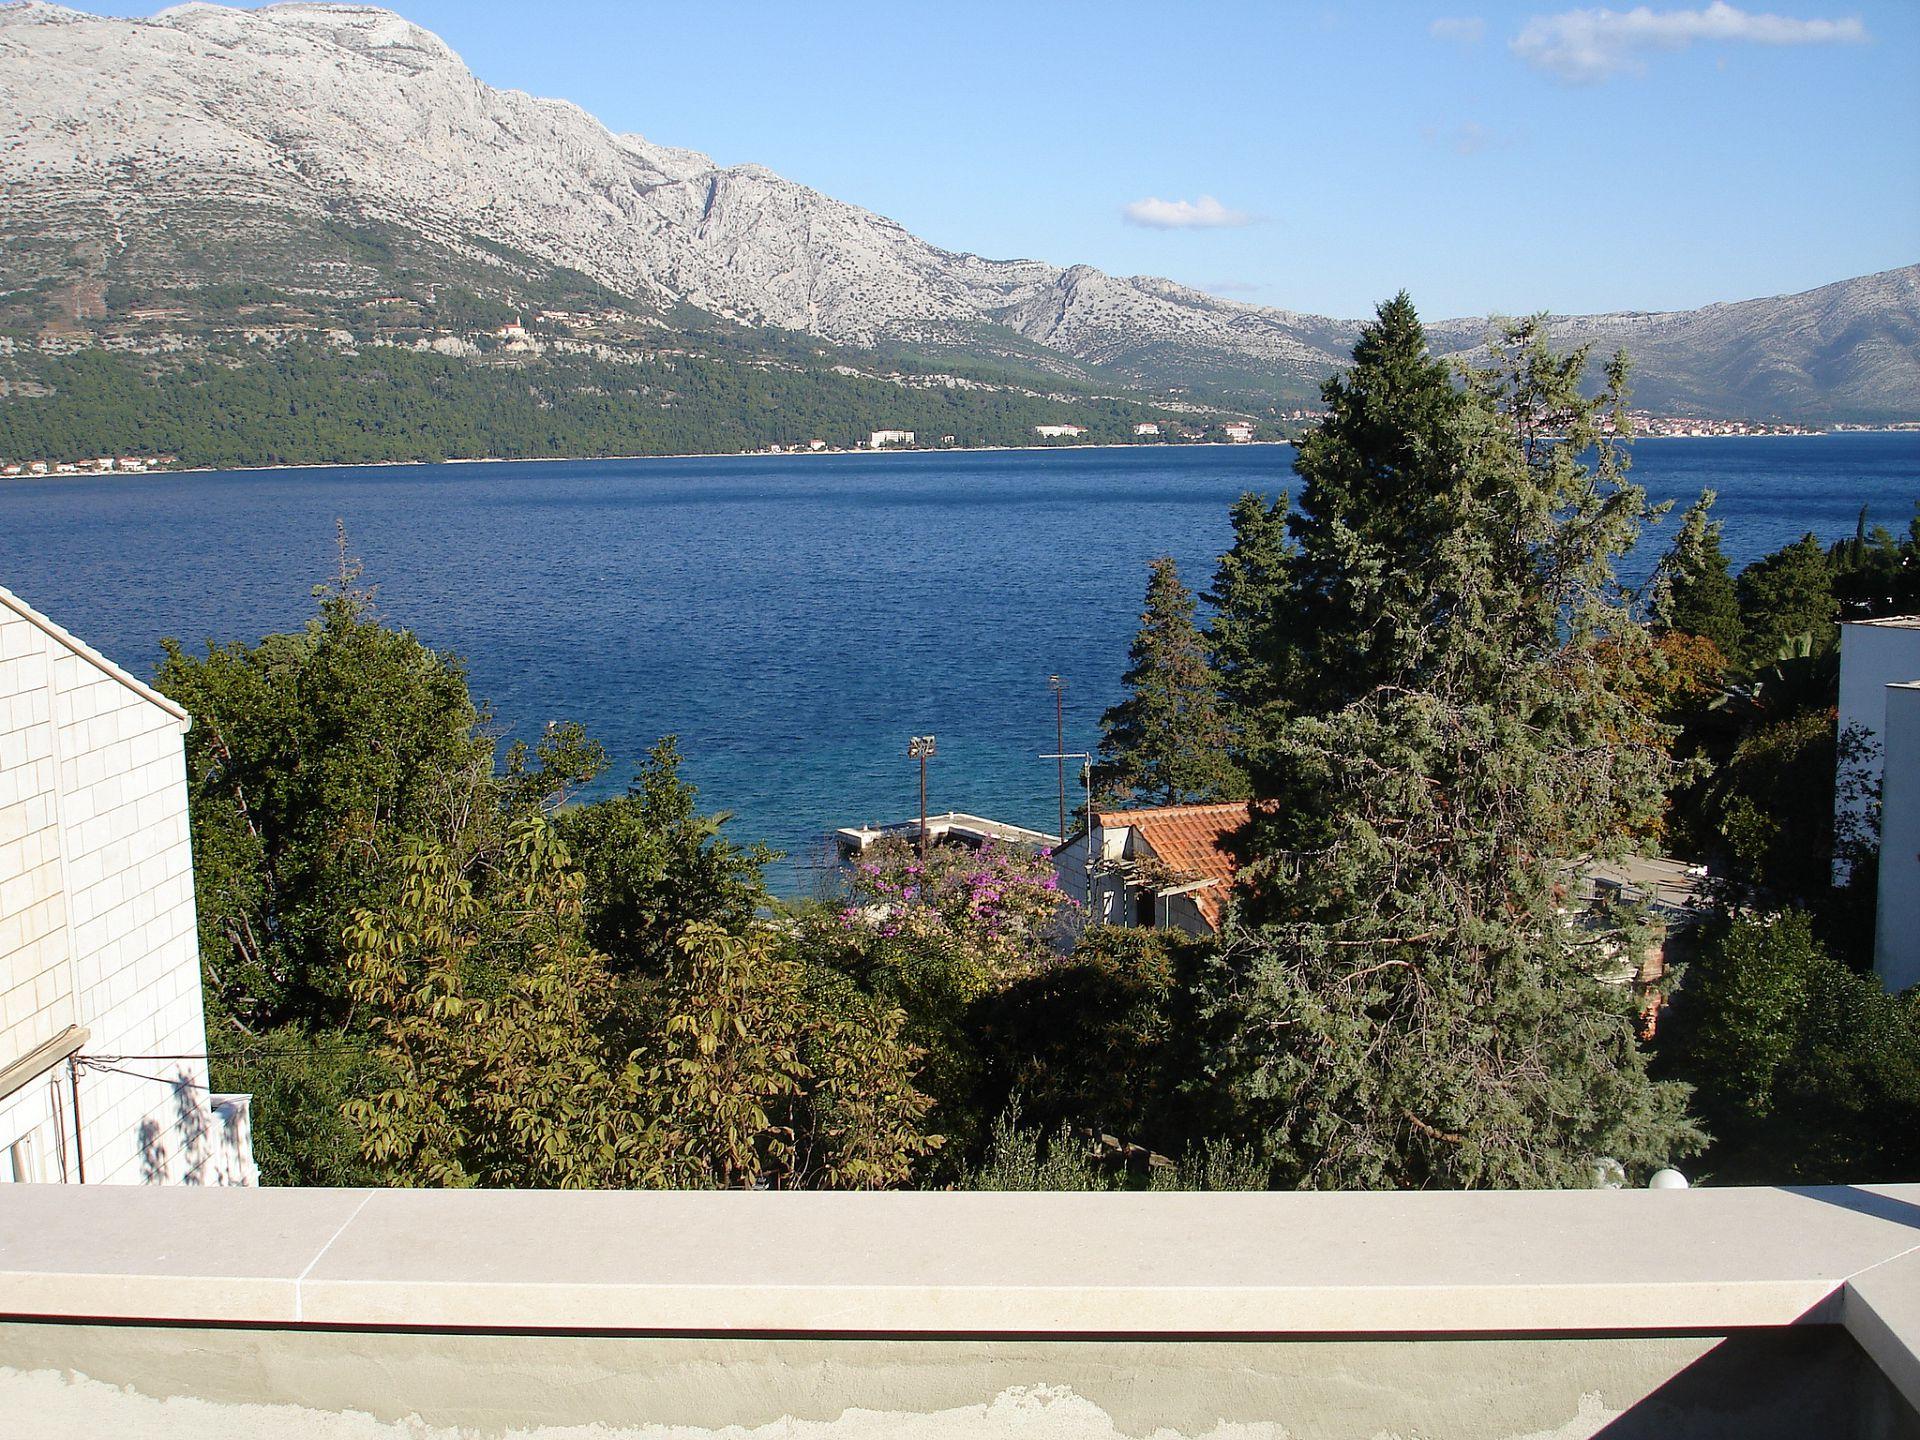 Ferienwohnung Ankica SA1(2) - Korcula (739749), Korčula, Insel Korcula, Dalmatien, Kroatien, Bild 1